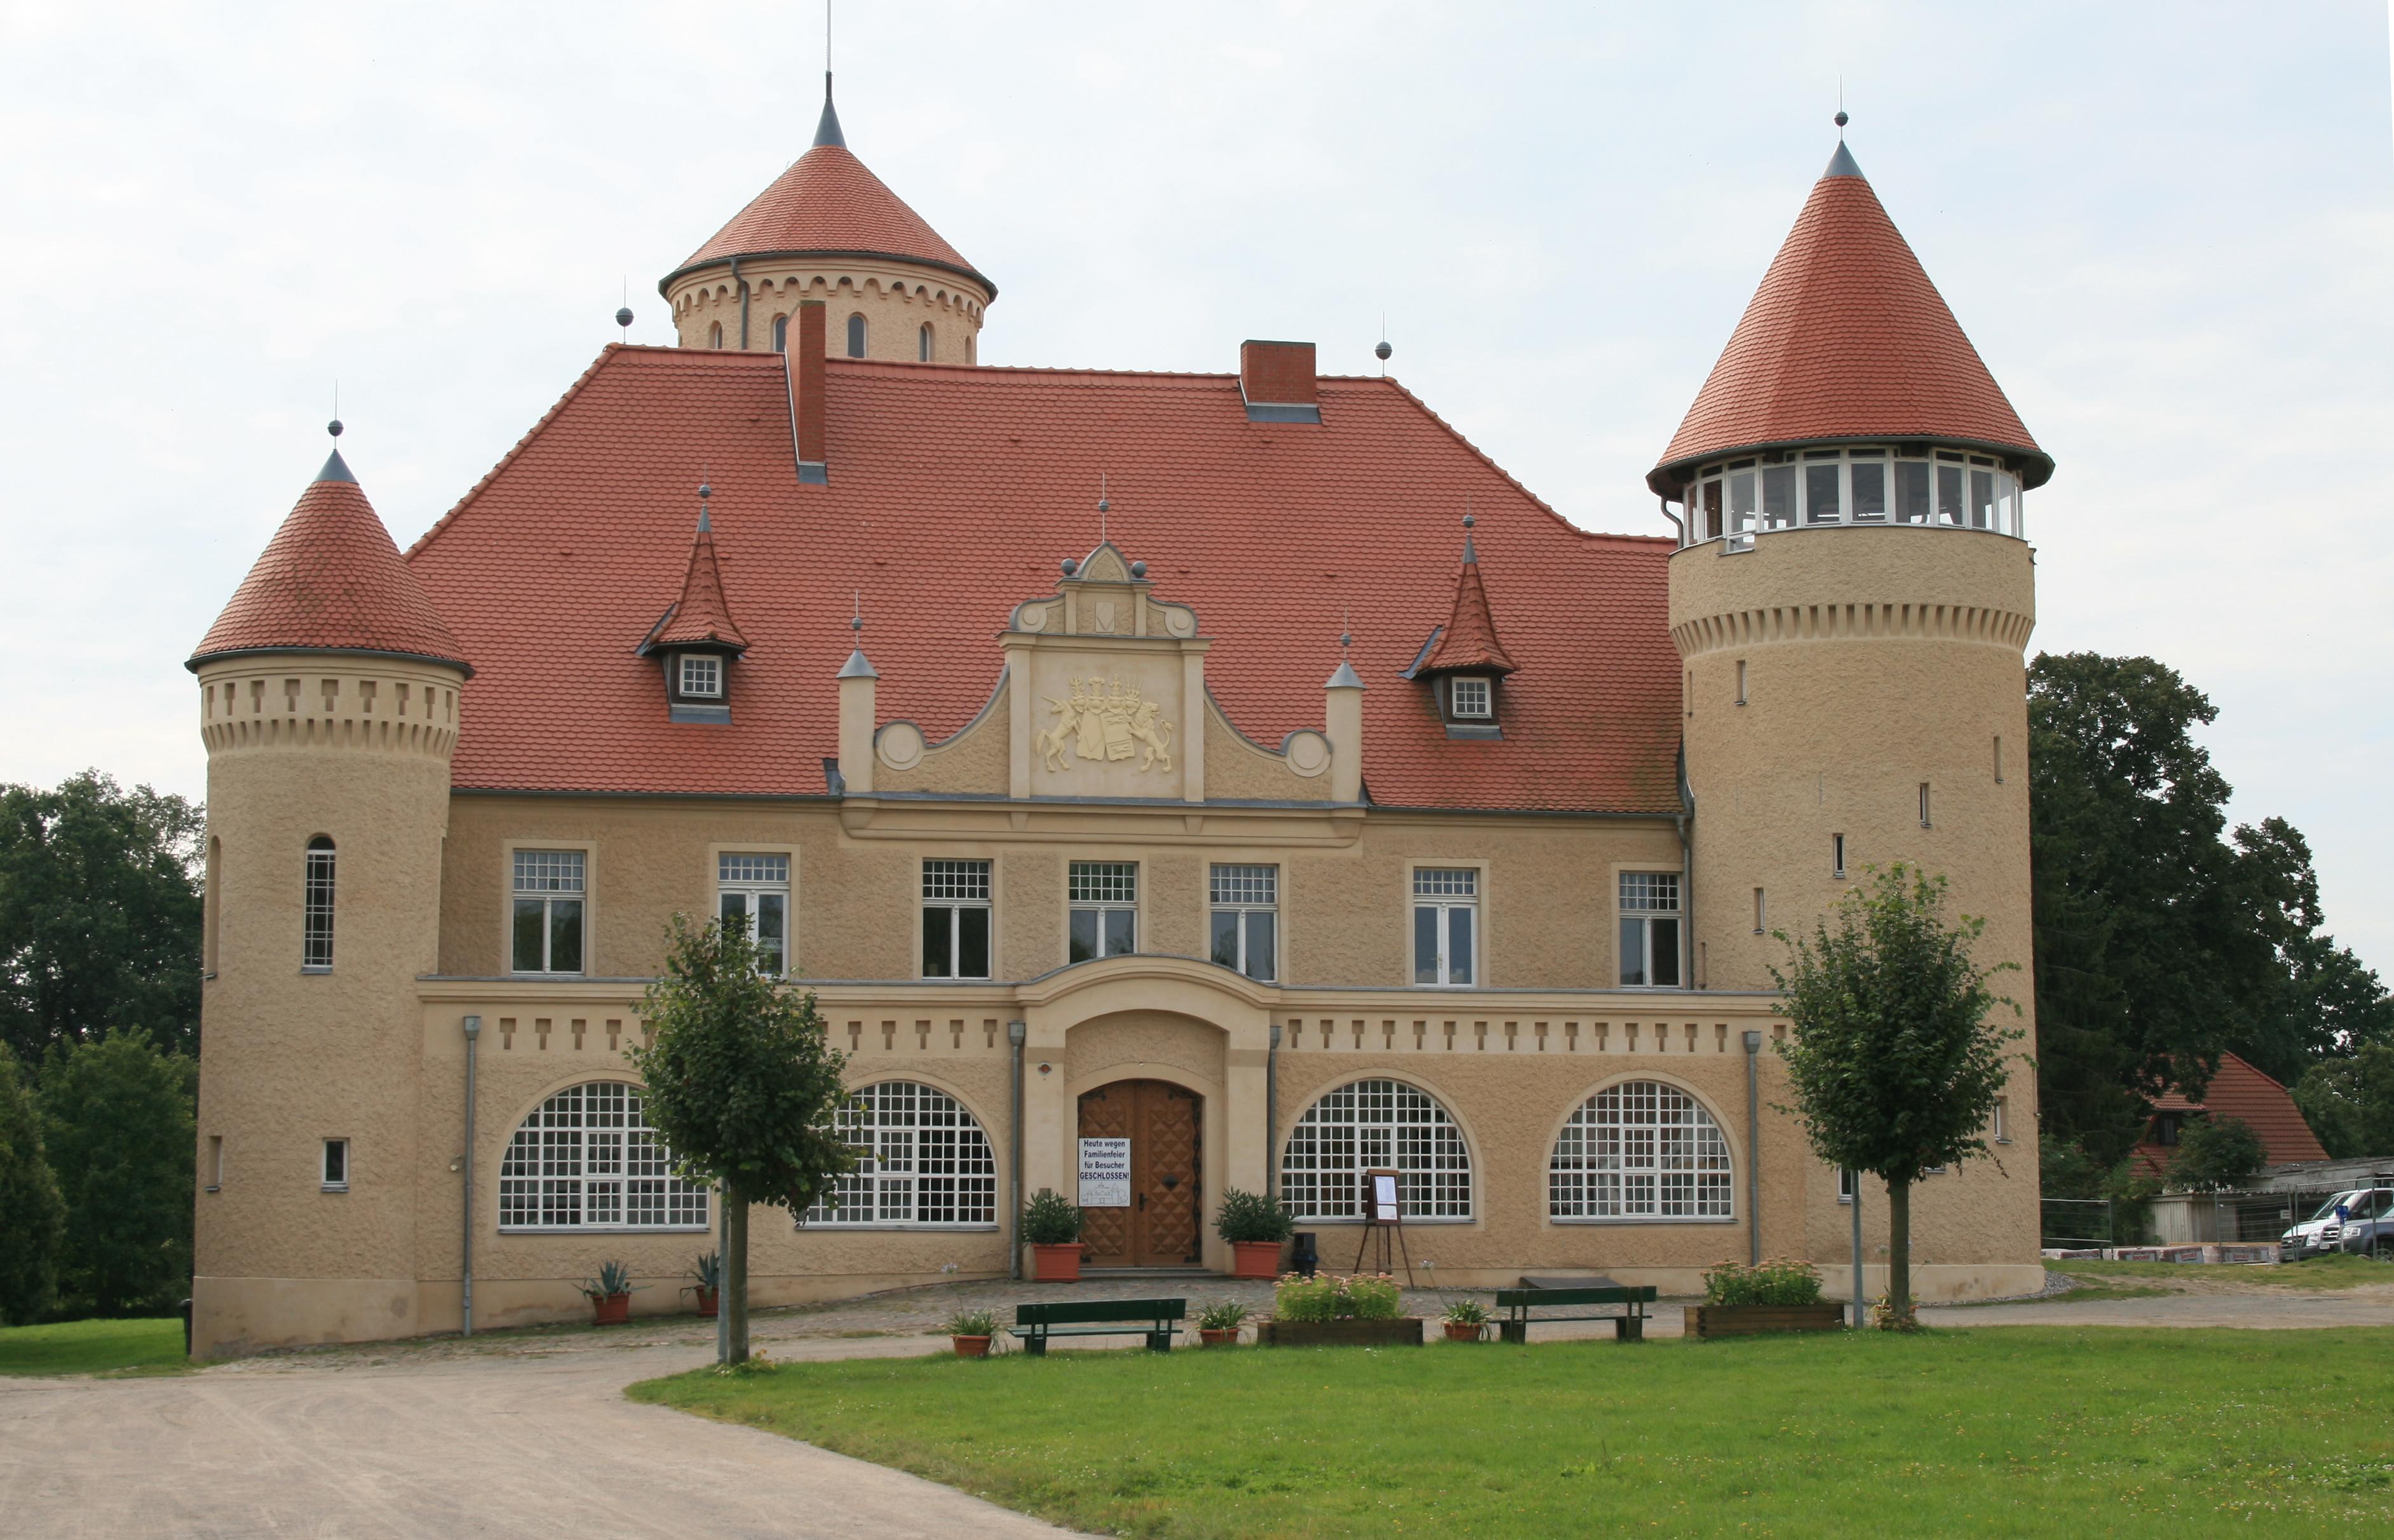 Schloß Stolpe Insel Usedom Ausflugsziel